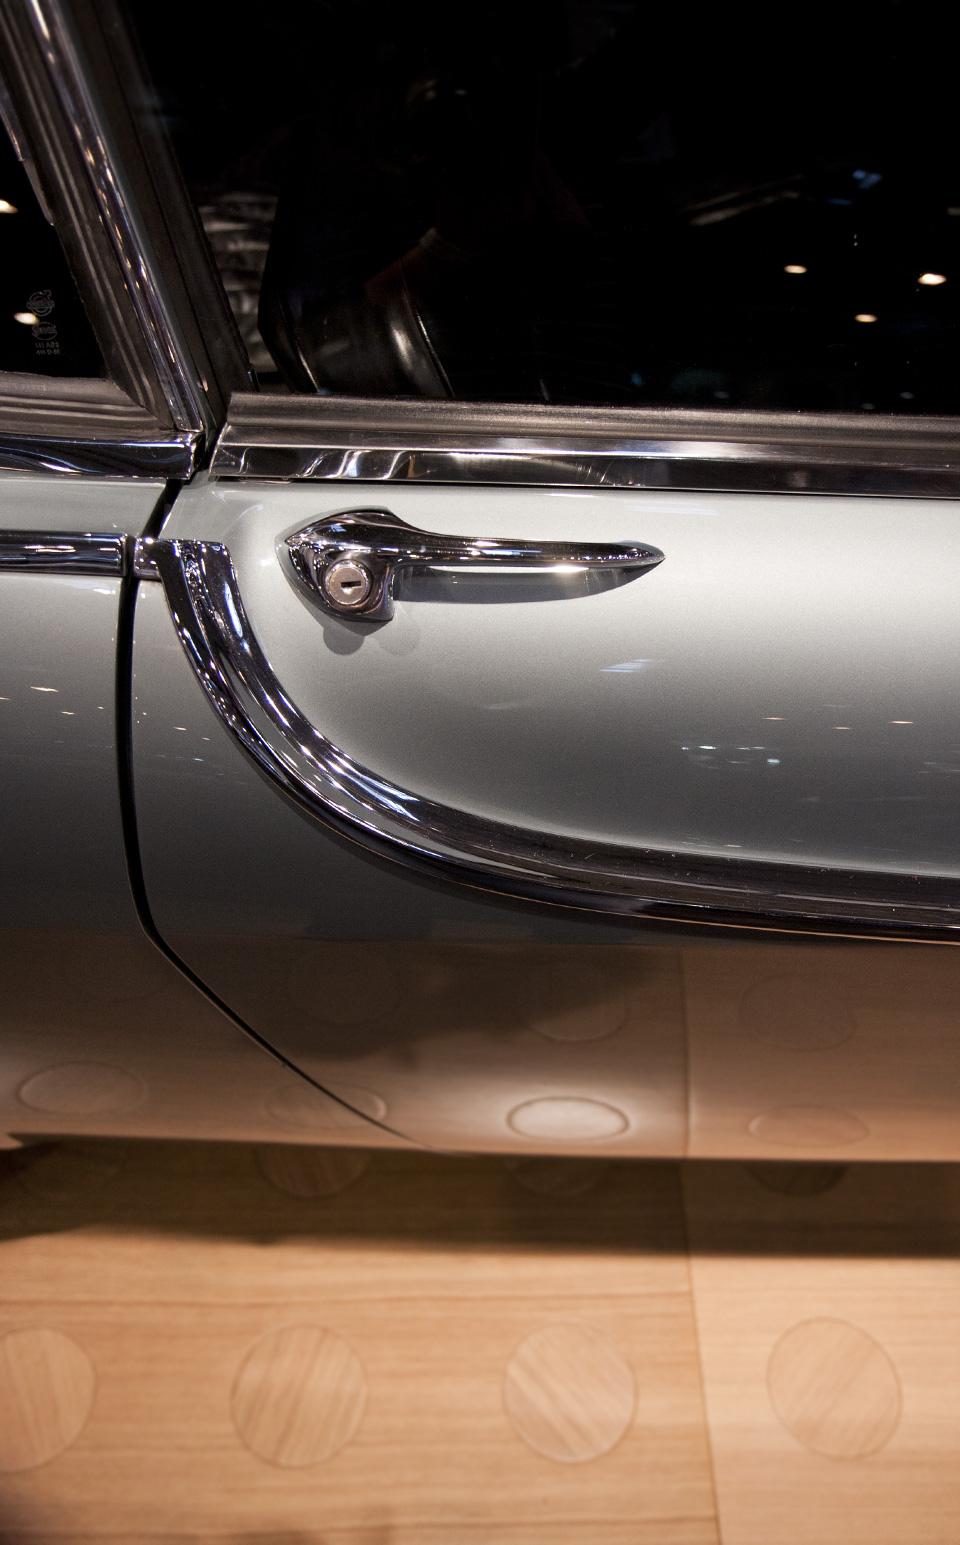 Jedem Automobil sein spezielles Detail: Chromleiste des Volvo.